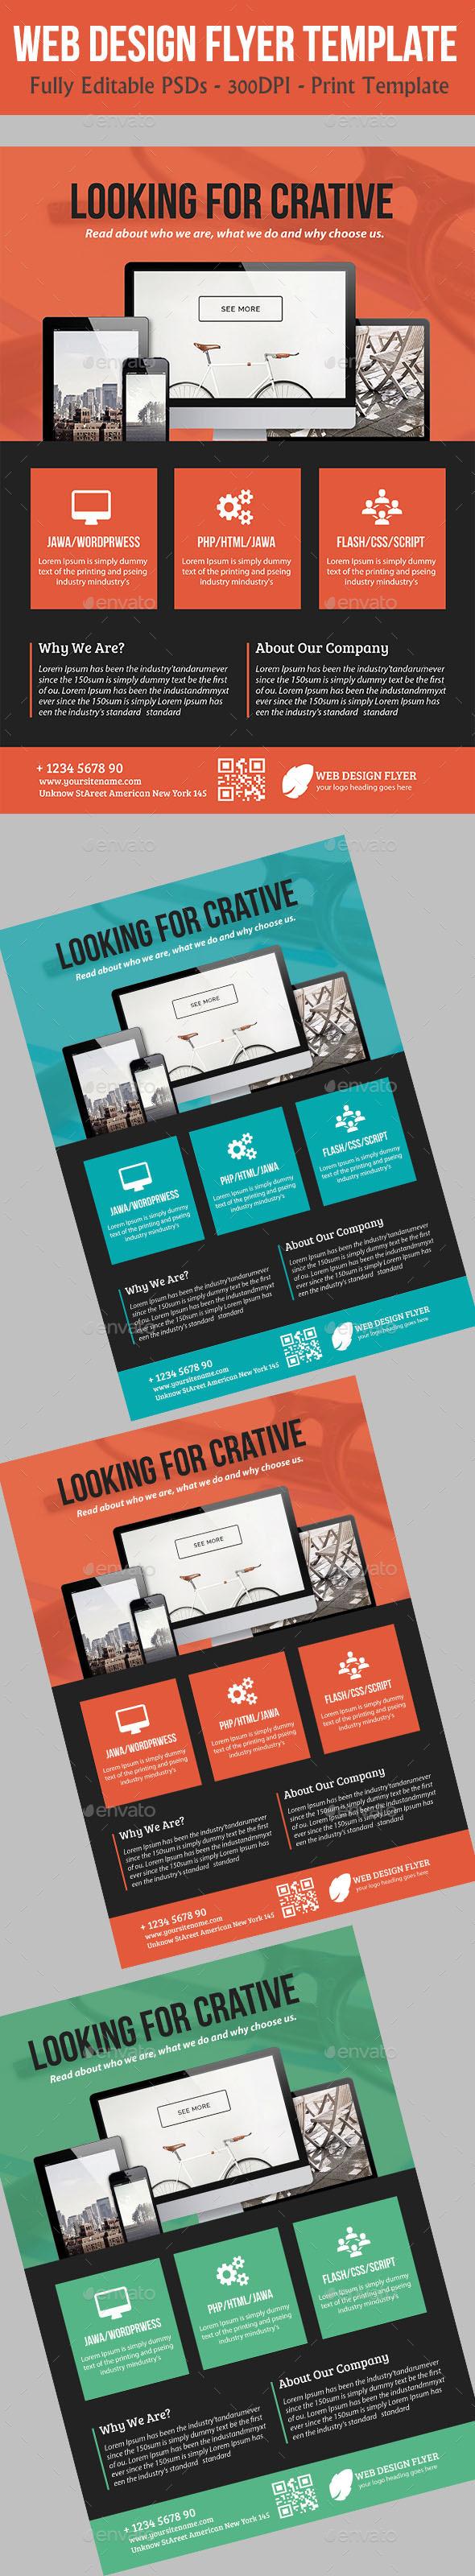 Web Design Flyer Temp - Commerce Flyers